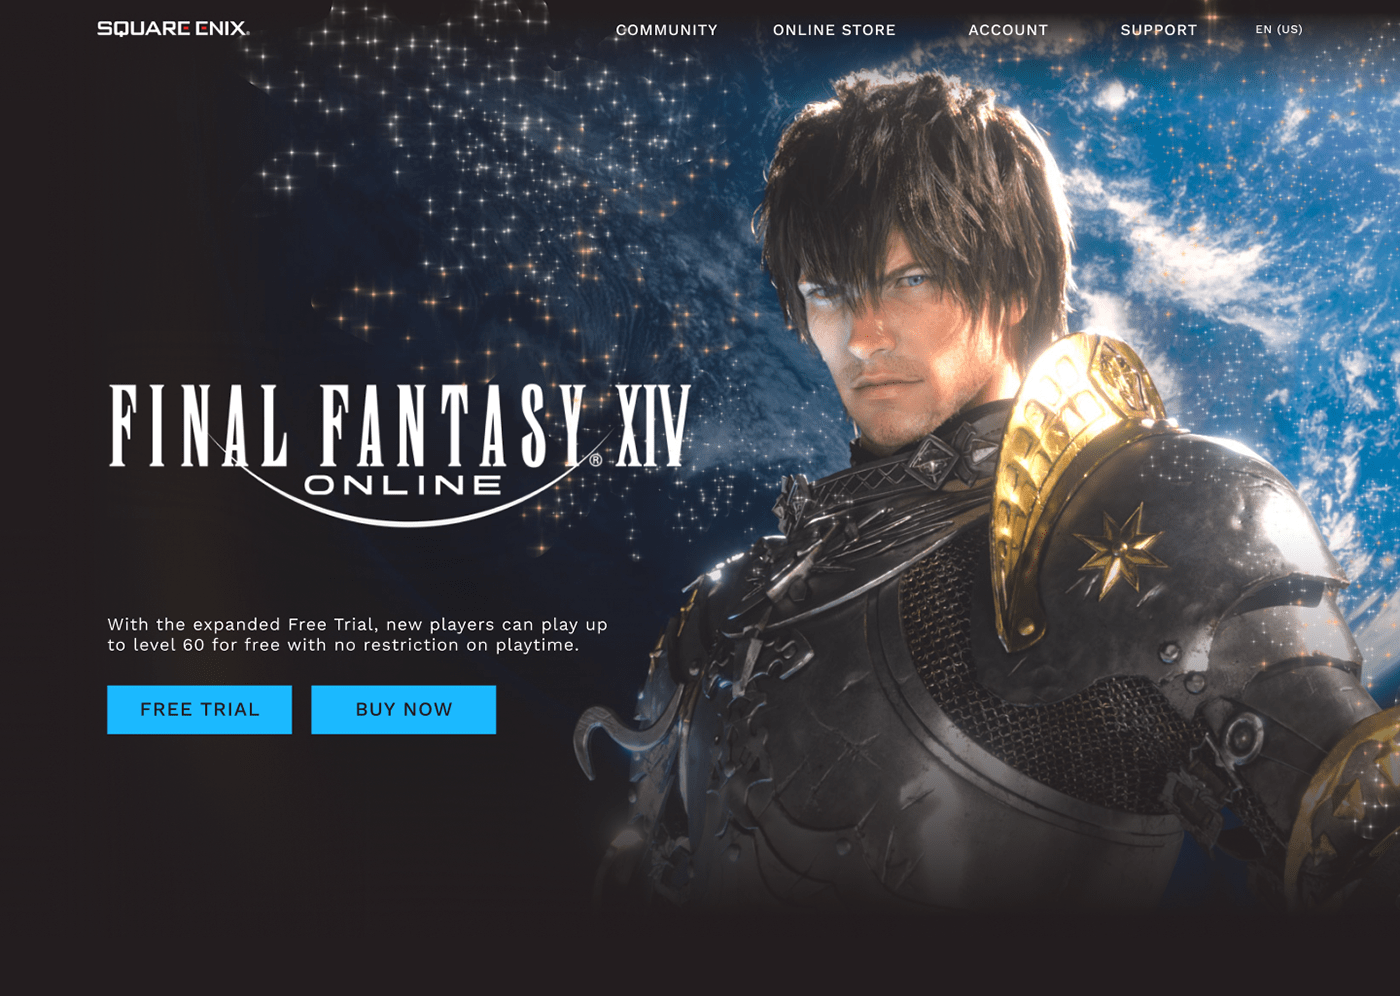 daily ui DailyUI FFXIV Figma final fantasy Interface landing page UI UI/UX Web Design